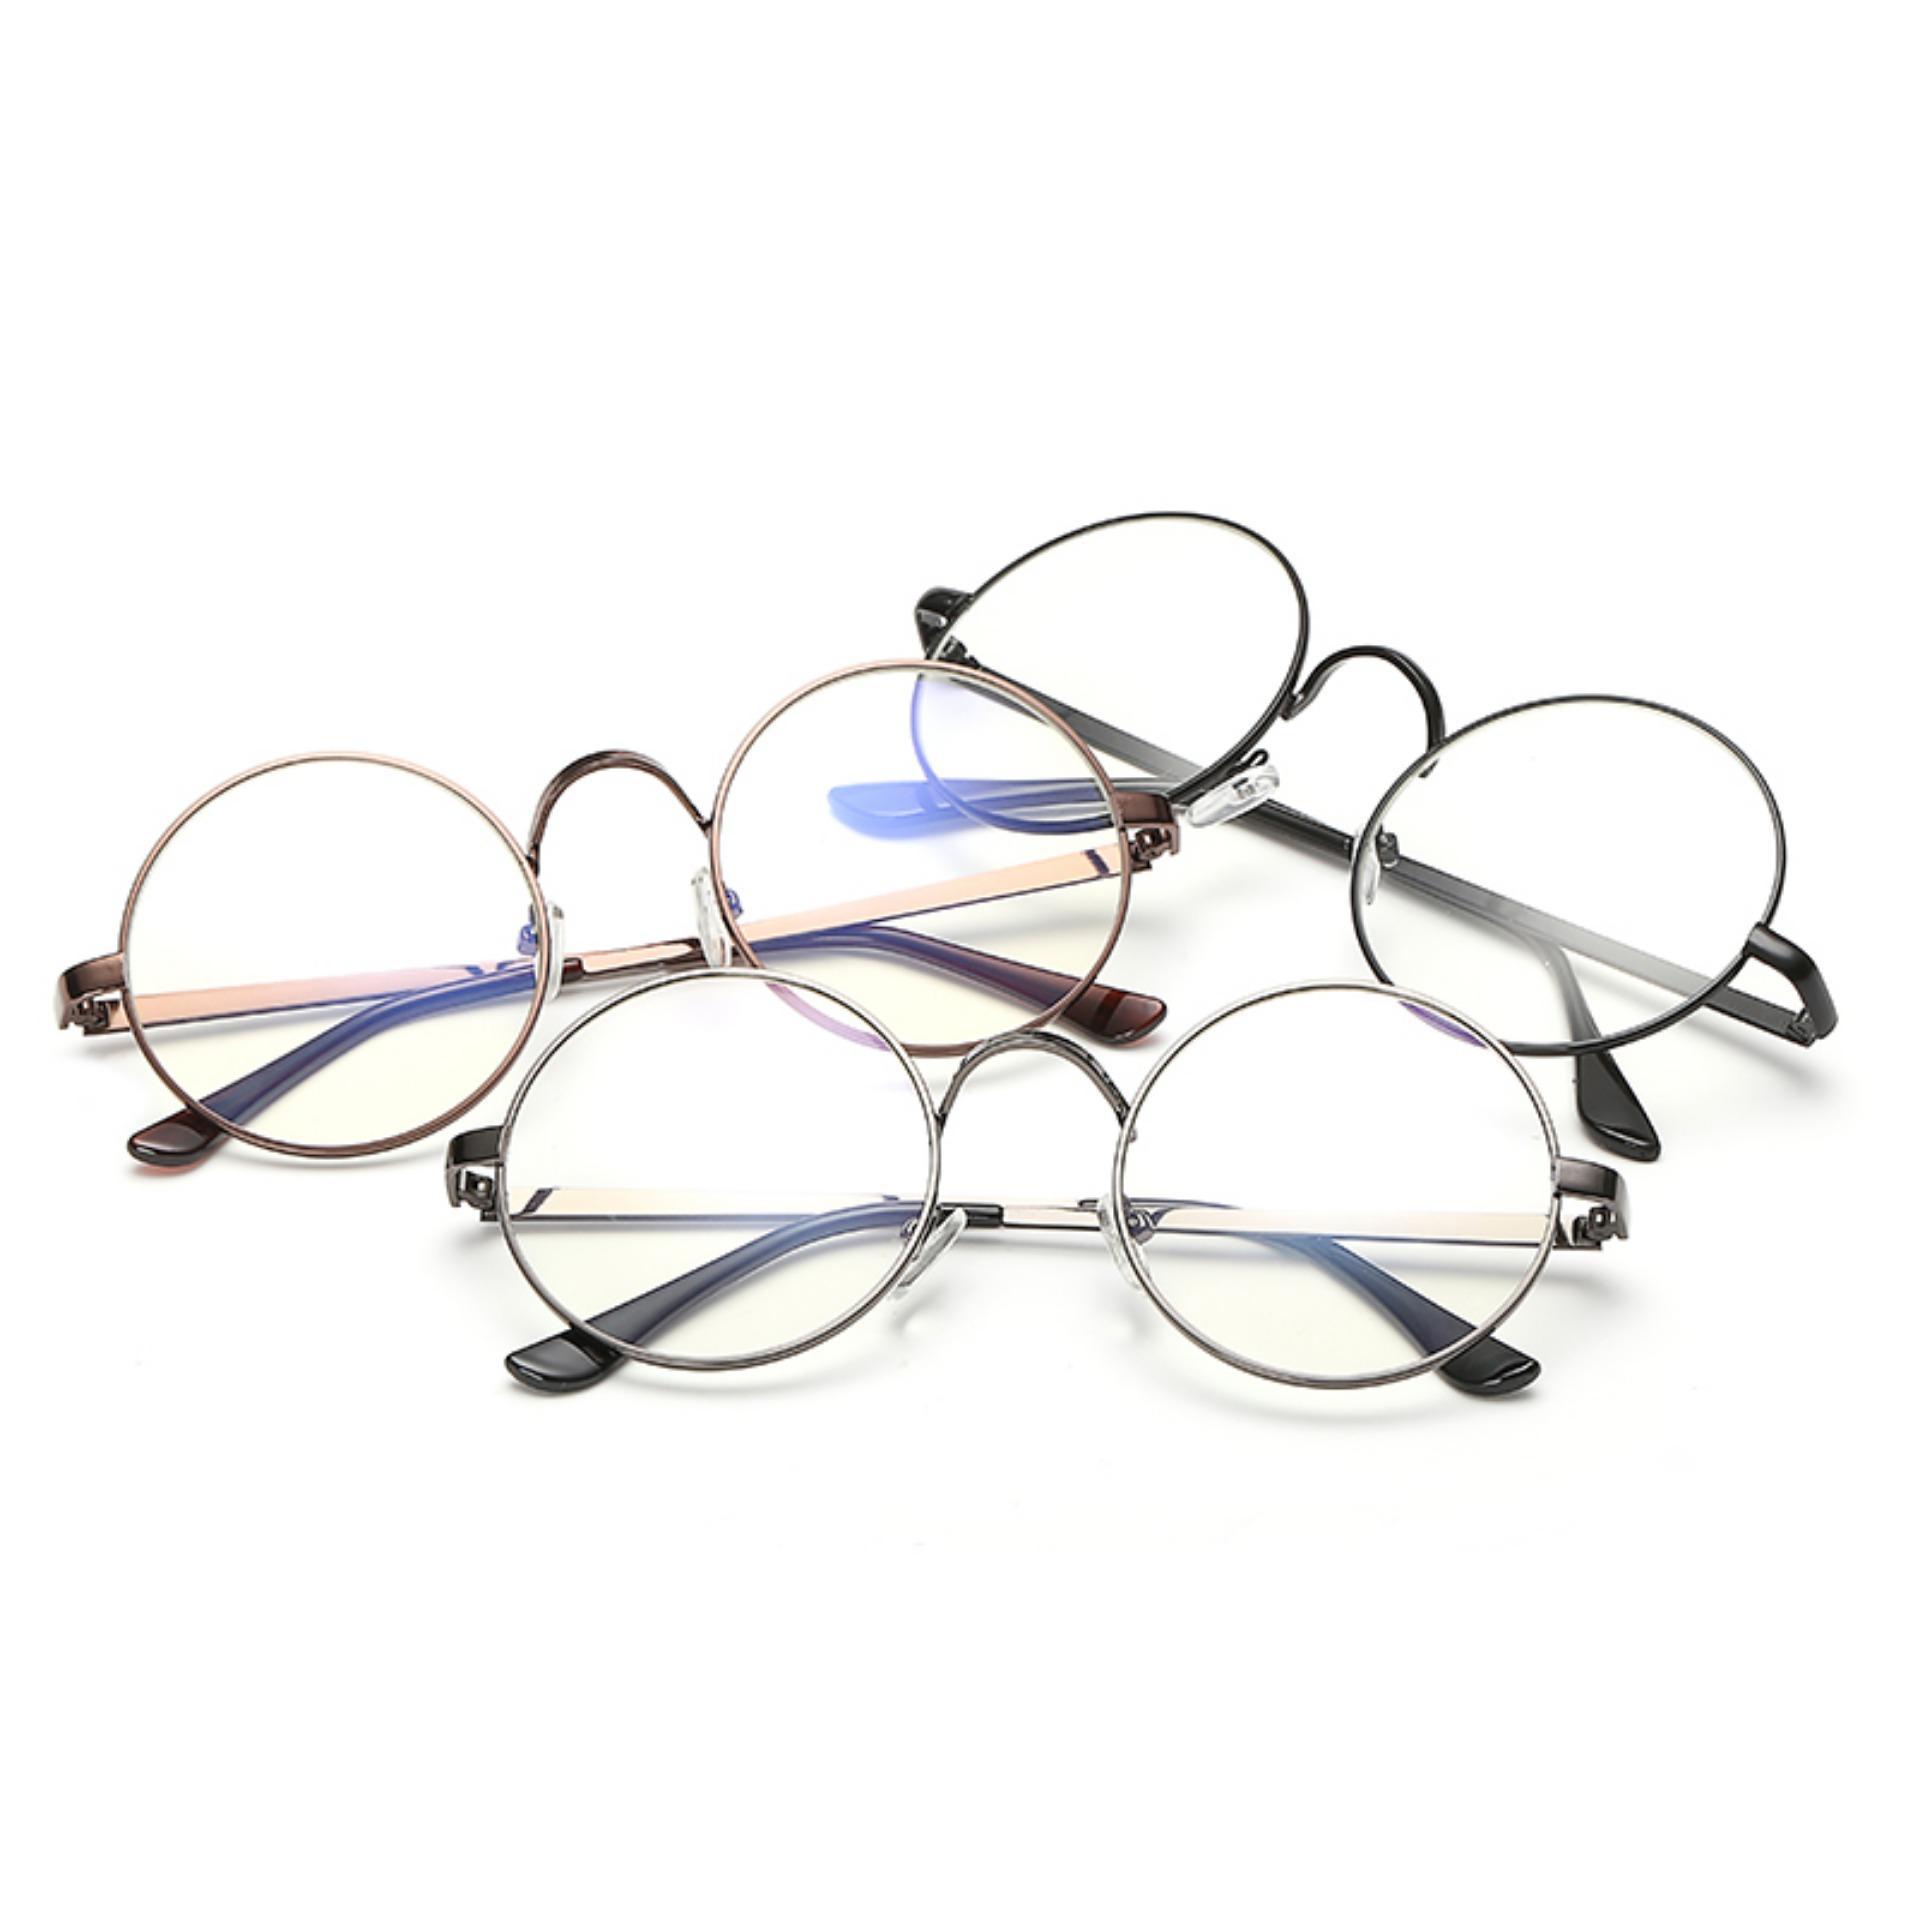 ... Men's Eyewear Fashion Vintage Retro Round Glasses BrightBlack FrameGlasses Plain for Myopia Men Eyeglasses Optical Frame ...